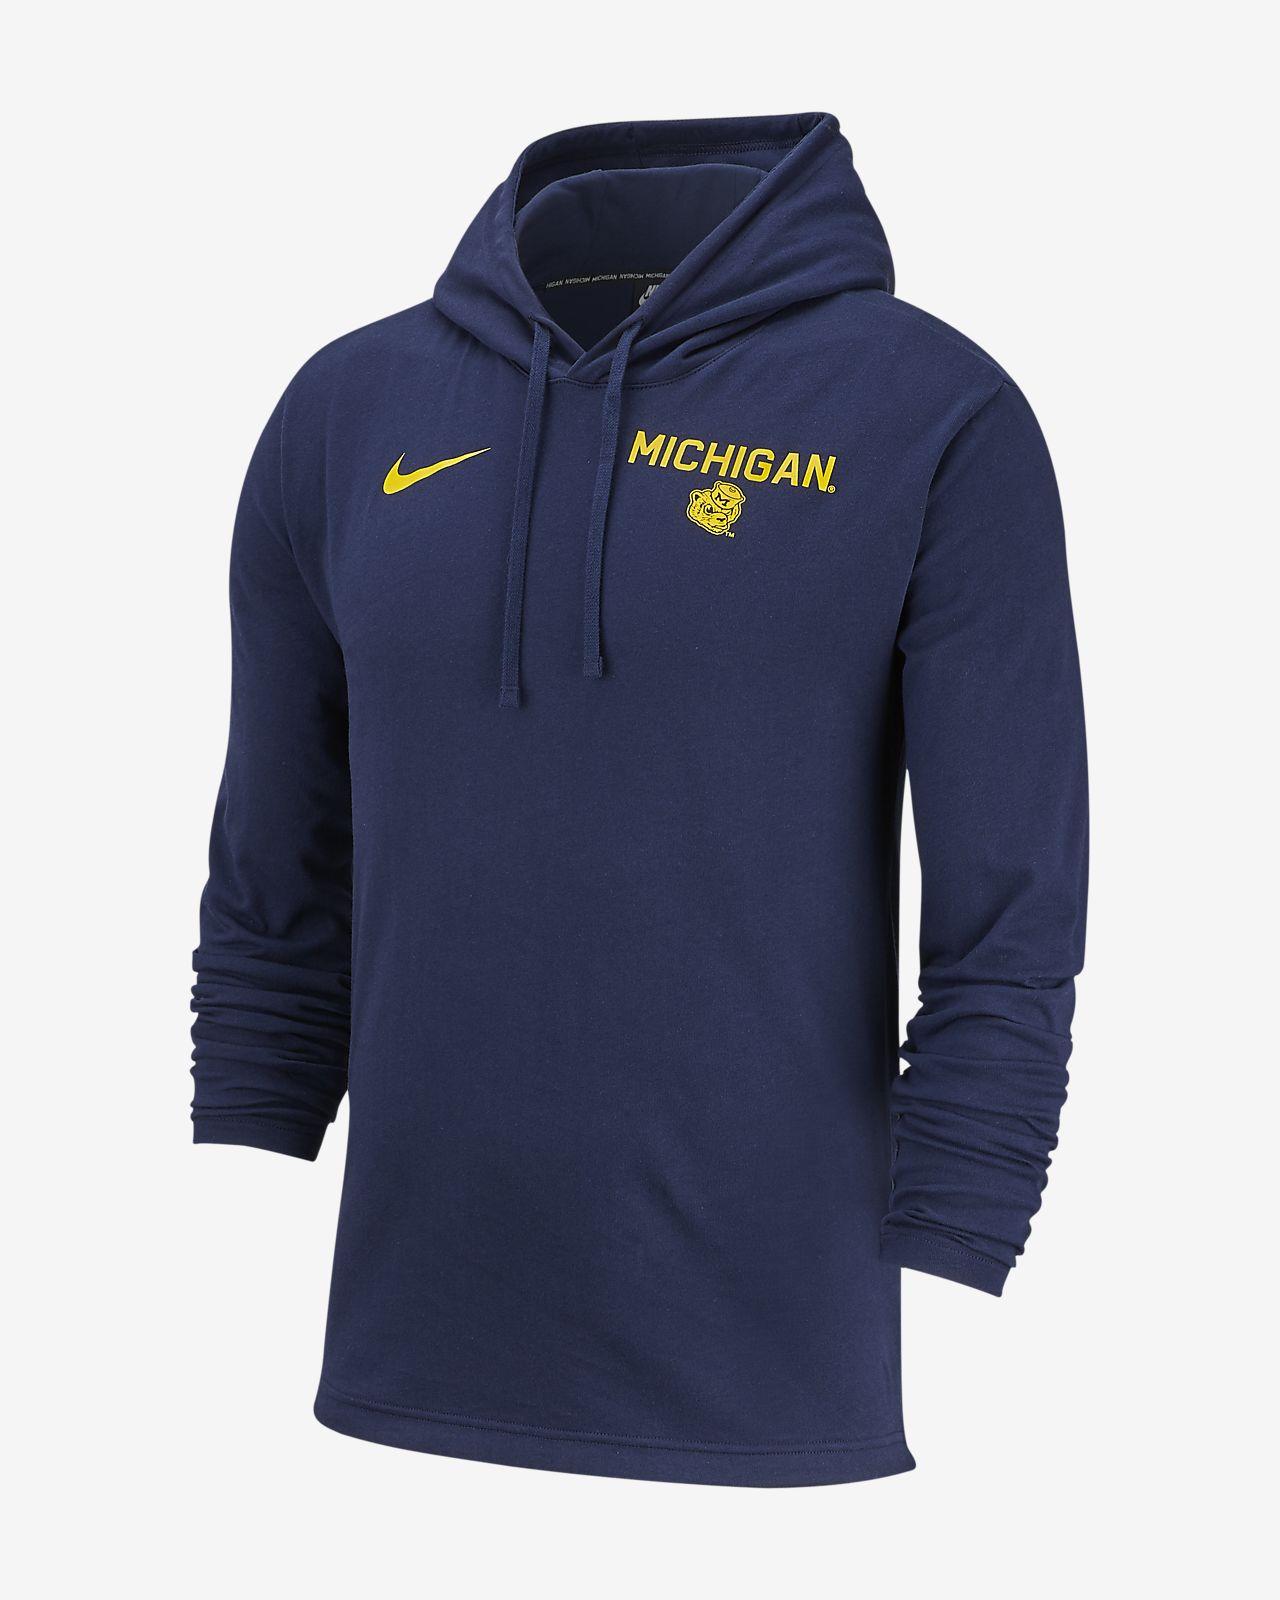 Nike College (Michigan) Men's Pullover Hoodie